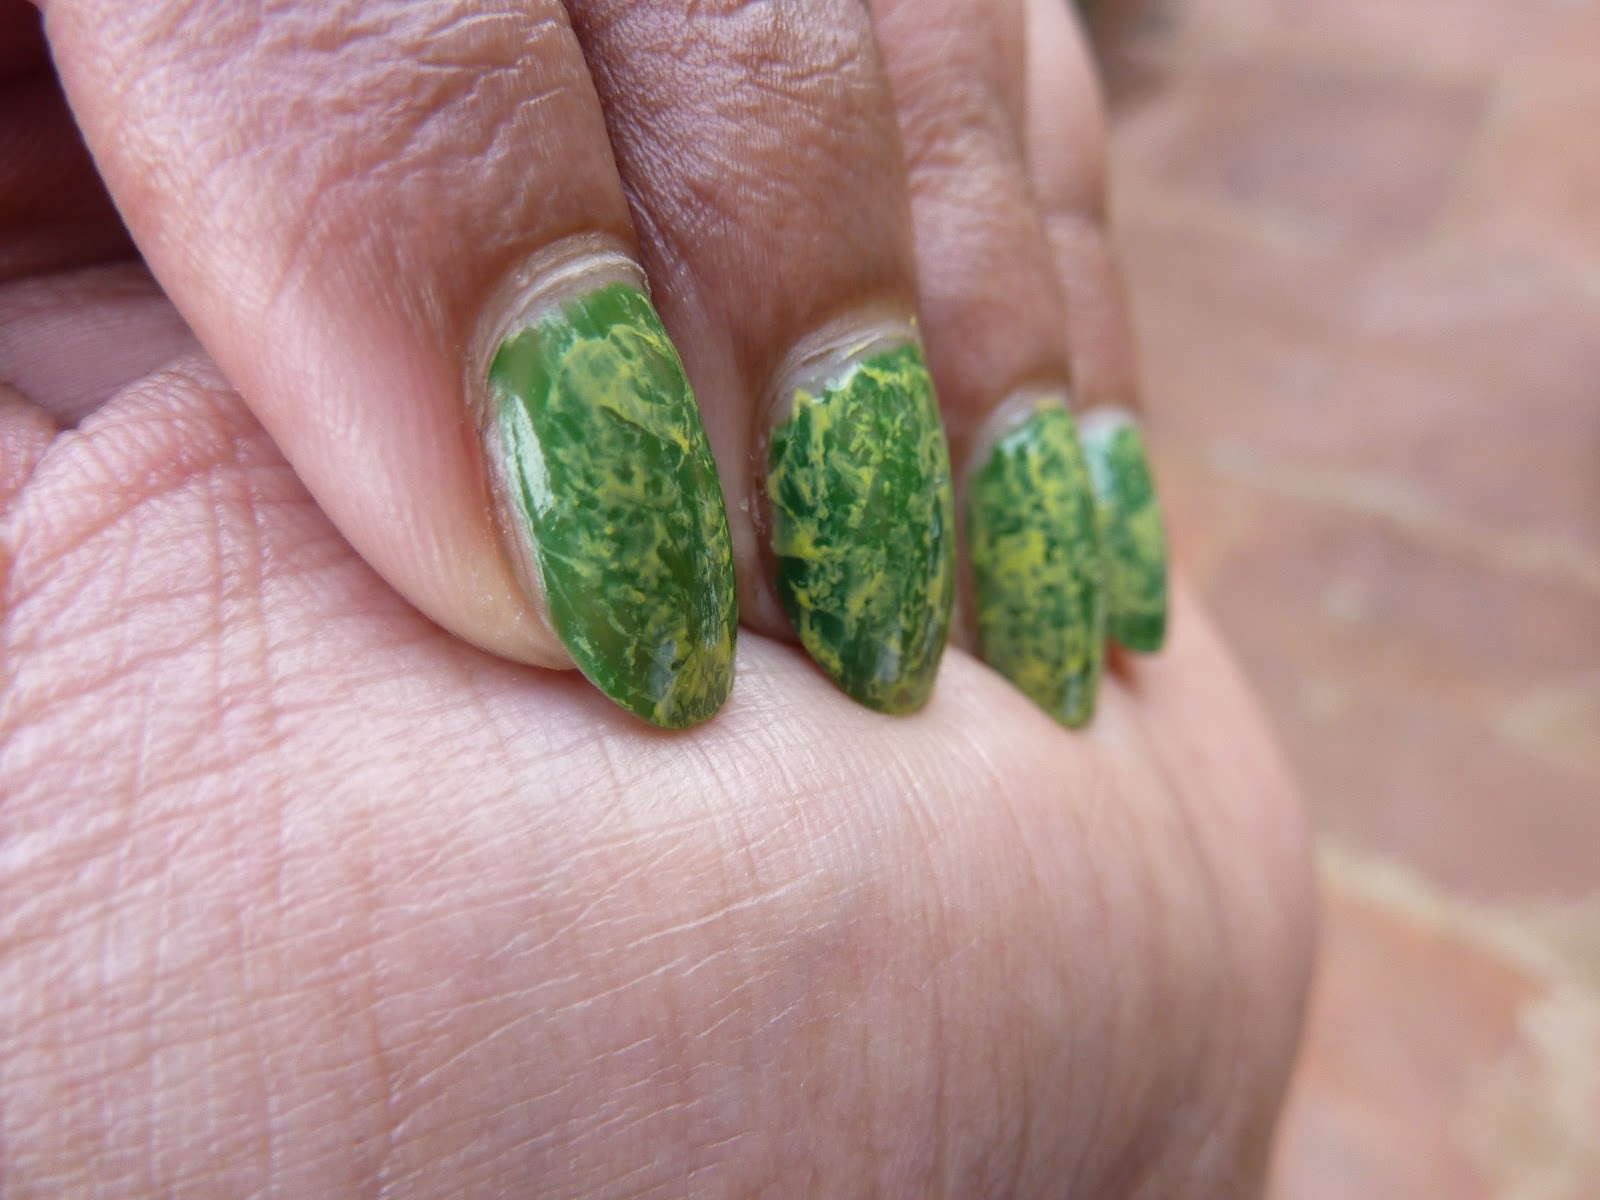 Tutorial : Nail Art : Effect created using plastic bag